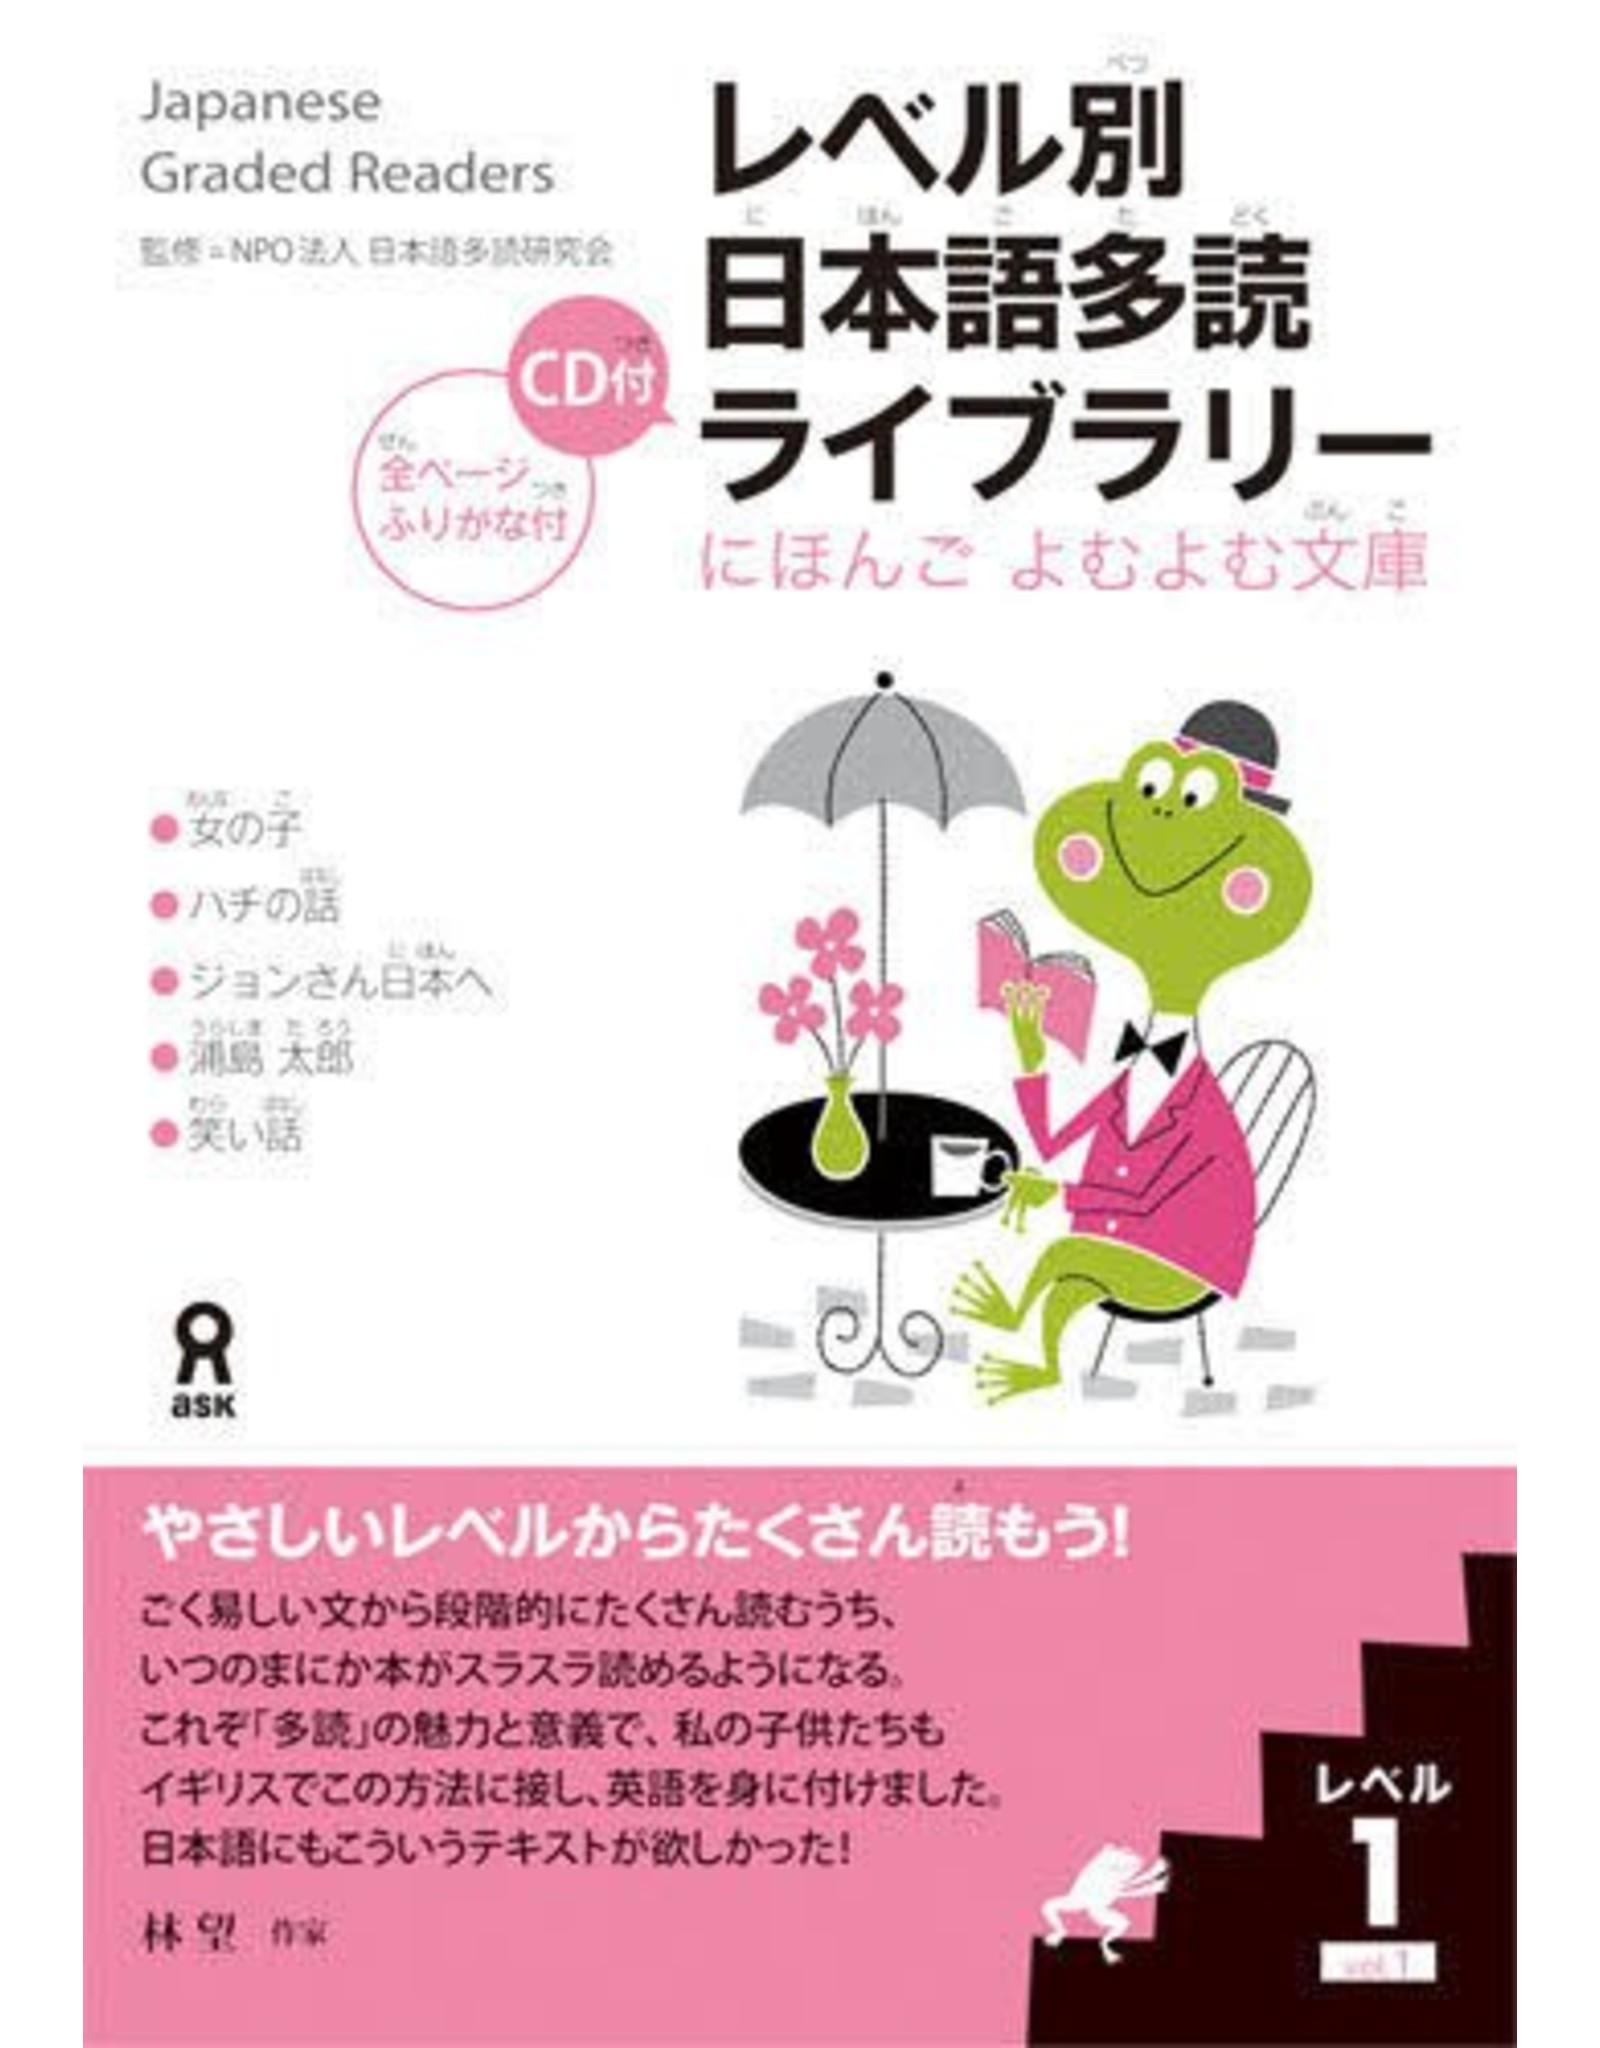 ASK LEVEL BETSU NIHONGO TADOKU LIBRARY (1) LEVEL 1 - JAPANESE GRADED READERS WCD VOL. 1 LEVEL 1